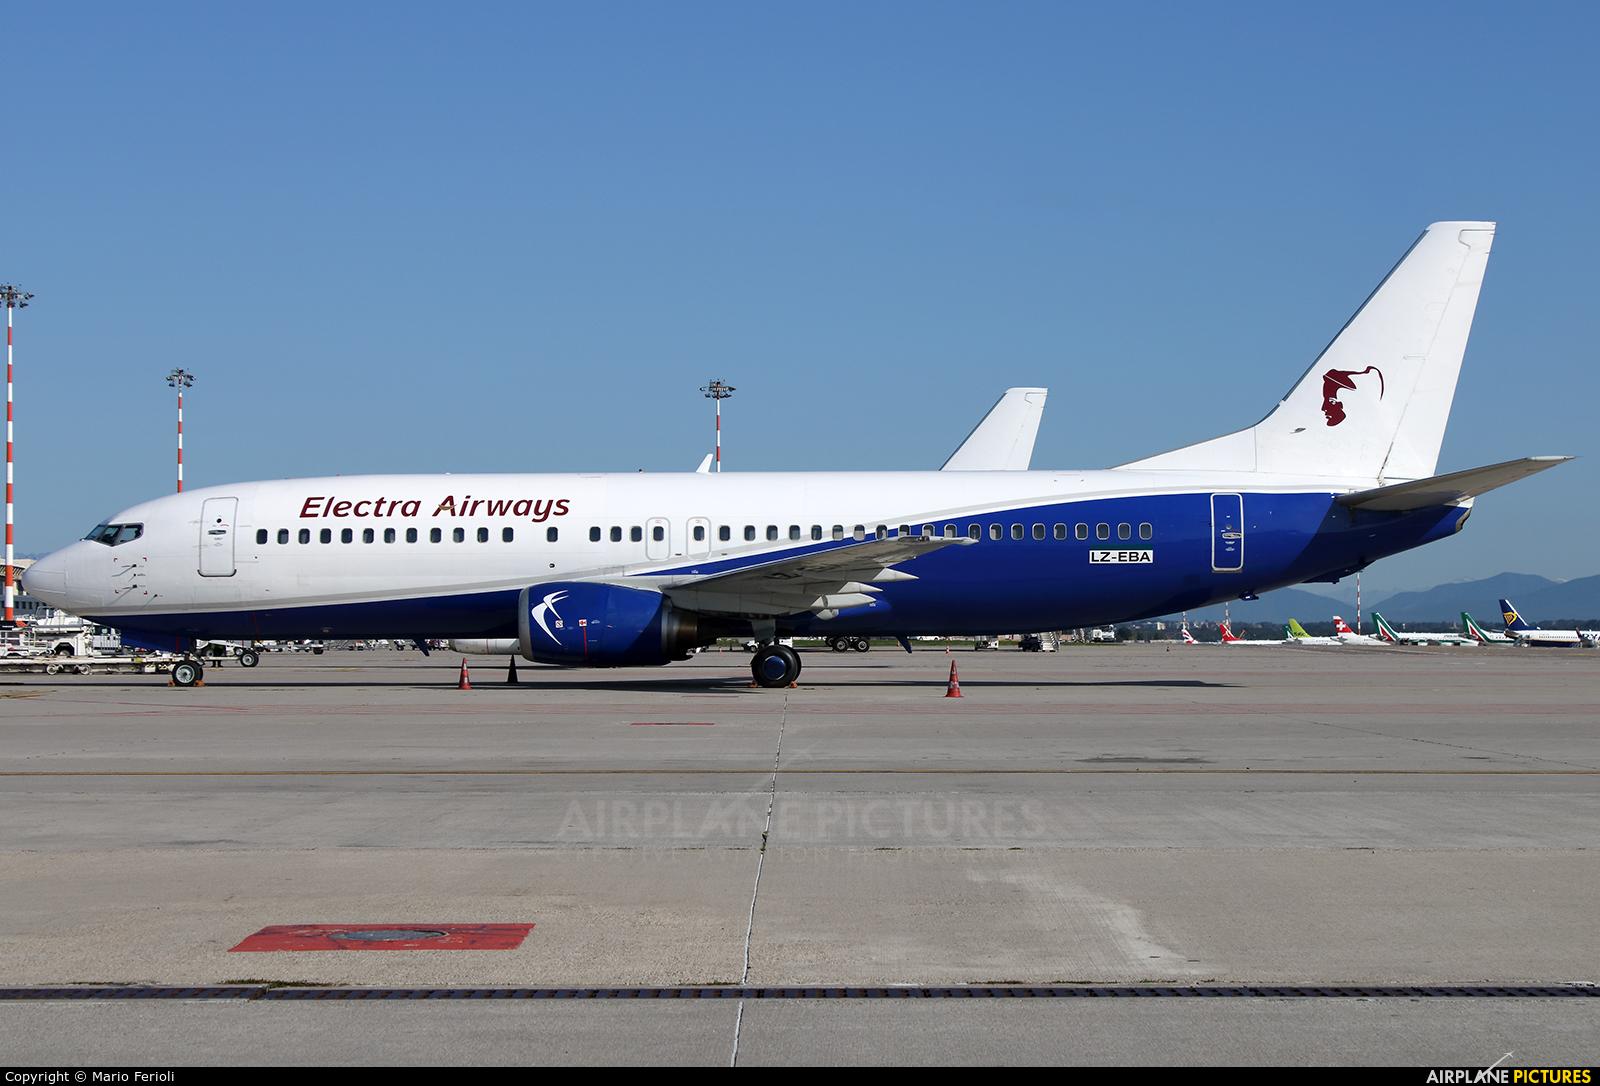 Electra Airways LZ-EBA aircraft at Milan - Malpensa